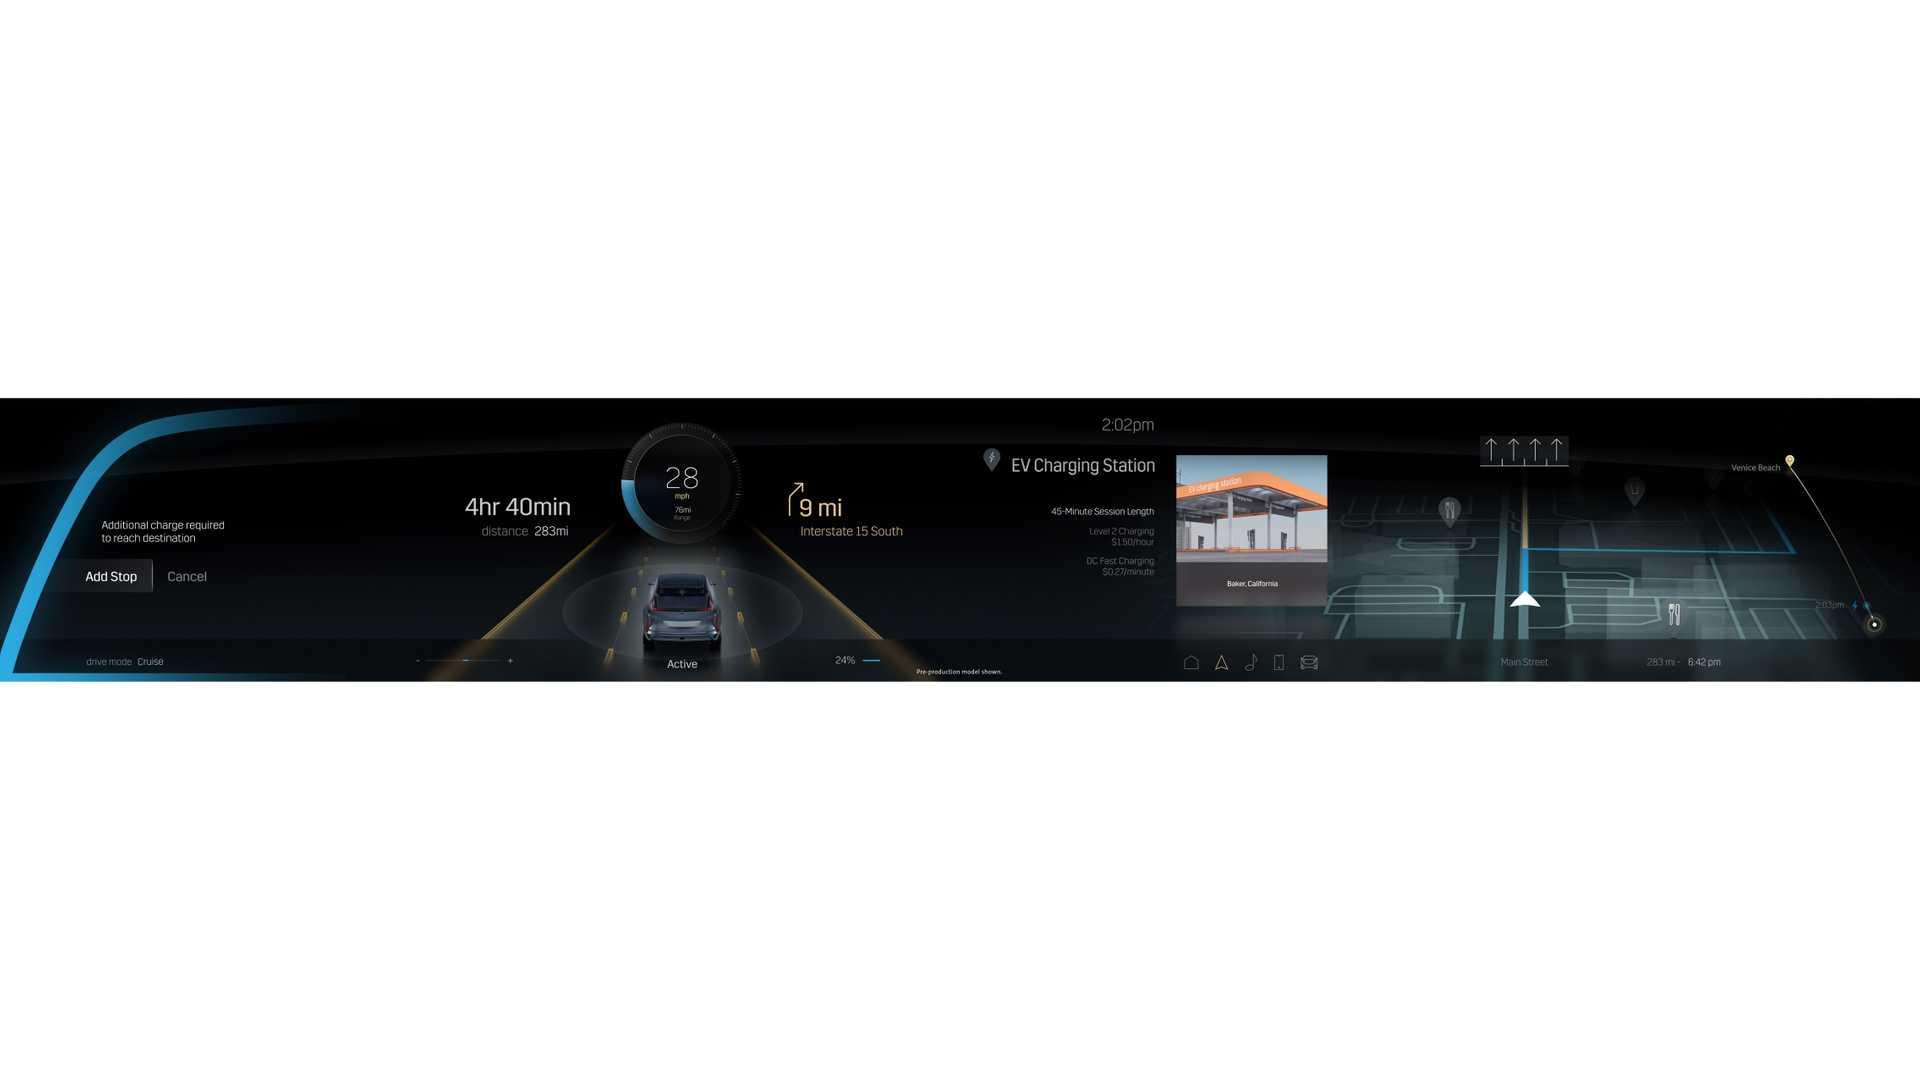 cadillac-lyriq-infotainment-display-full-width